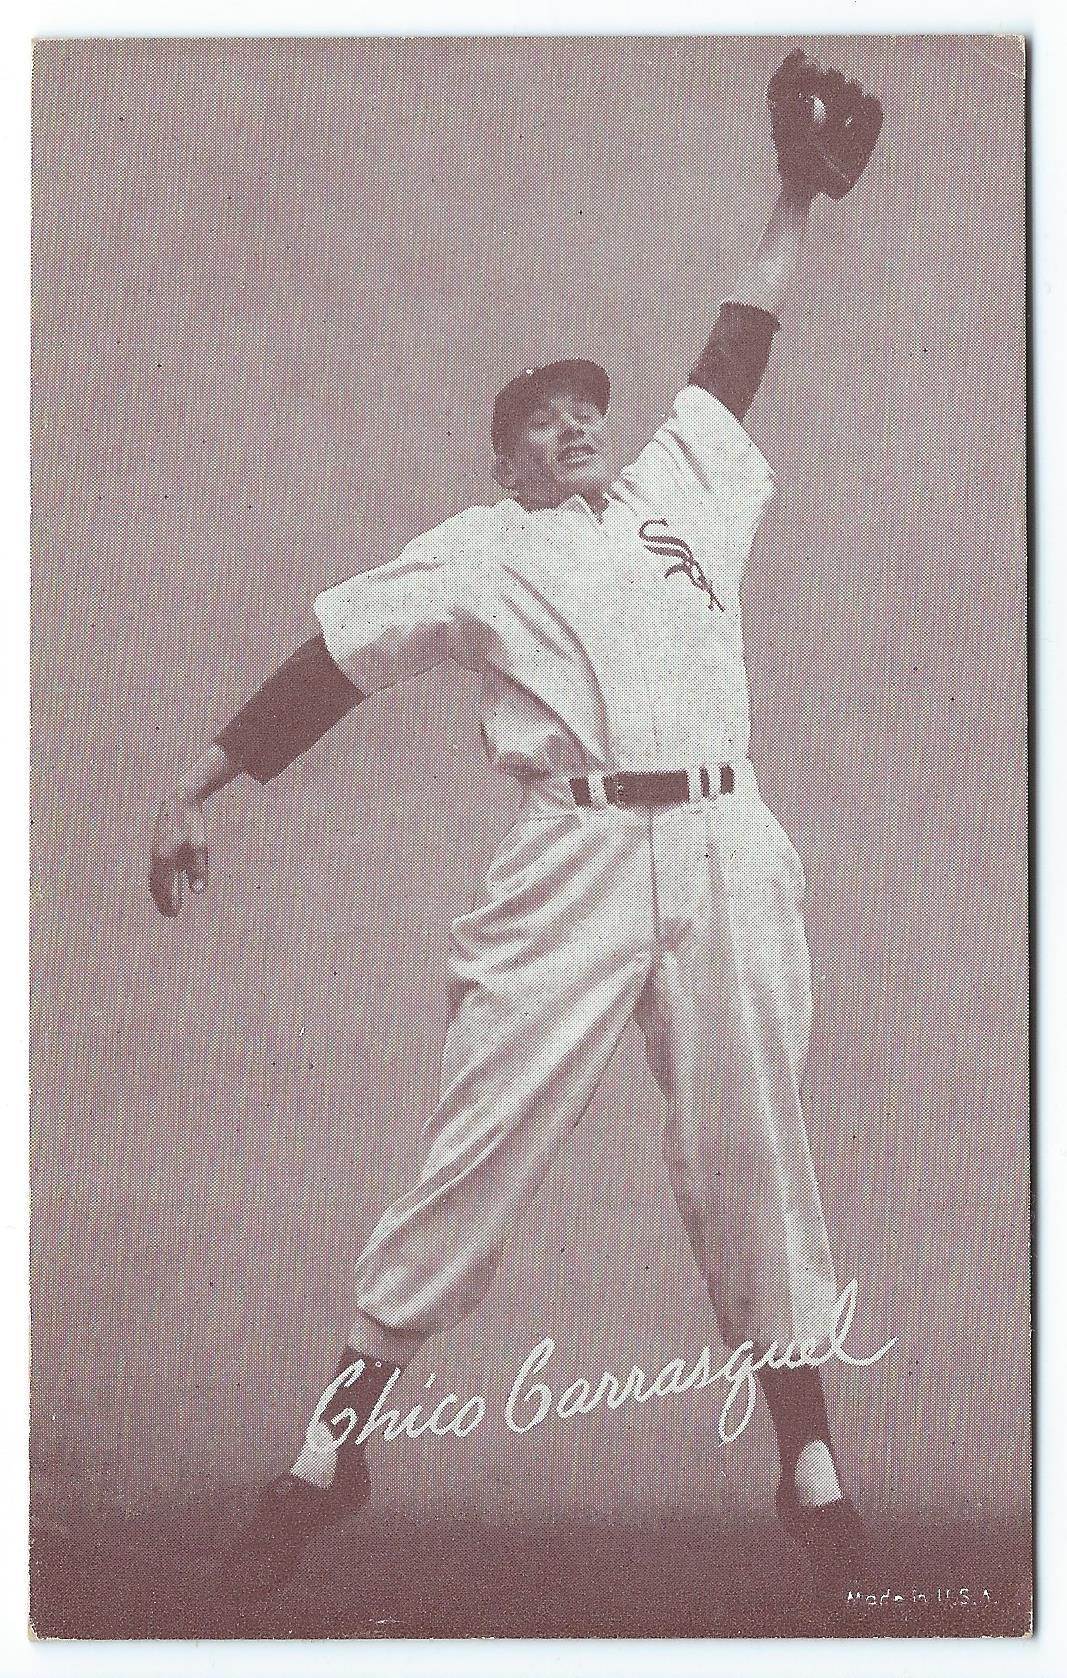 1947-66 Exhibits #34A Chico Carrasquel/White Sox